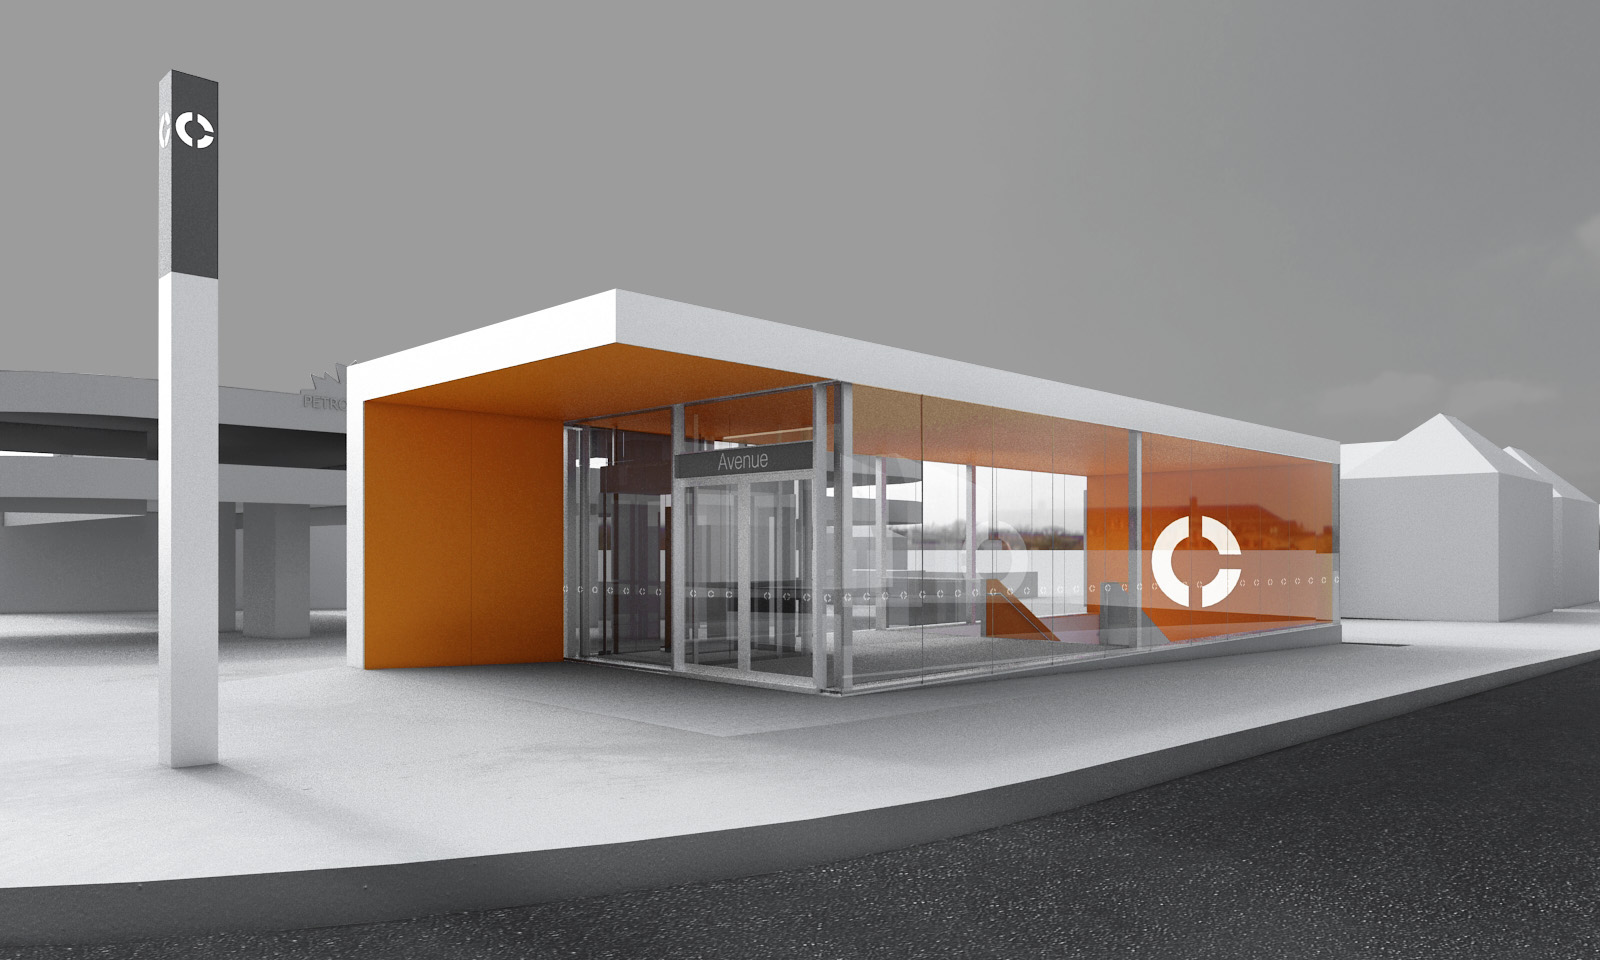 Eglinton Crosstown LRT DX - Station Secondary Entrance